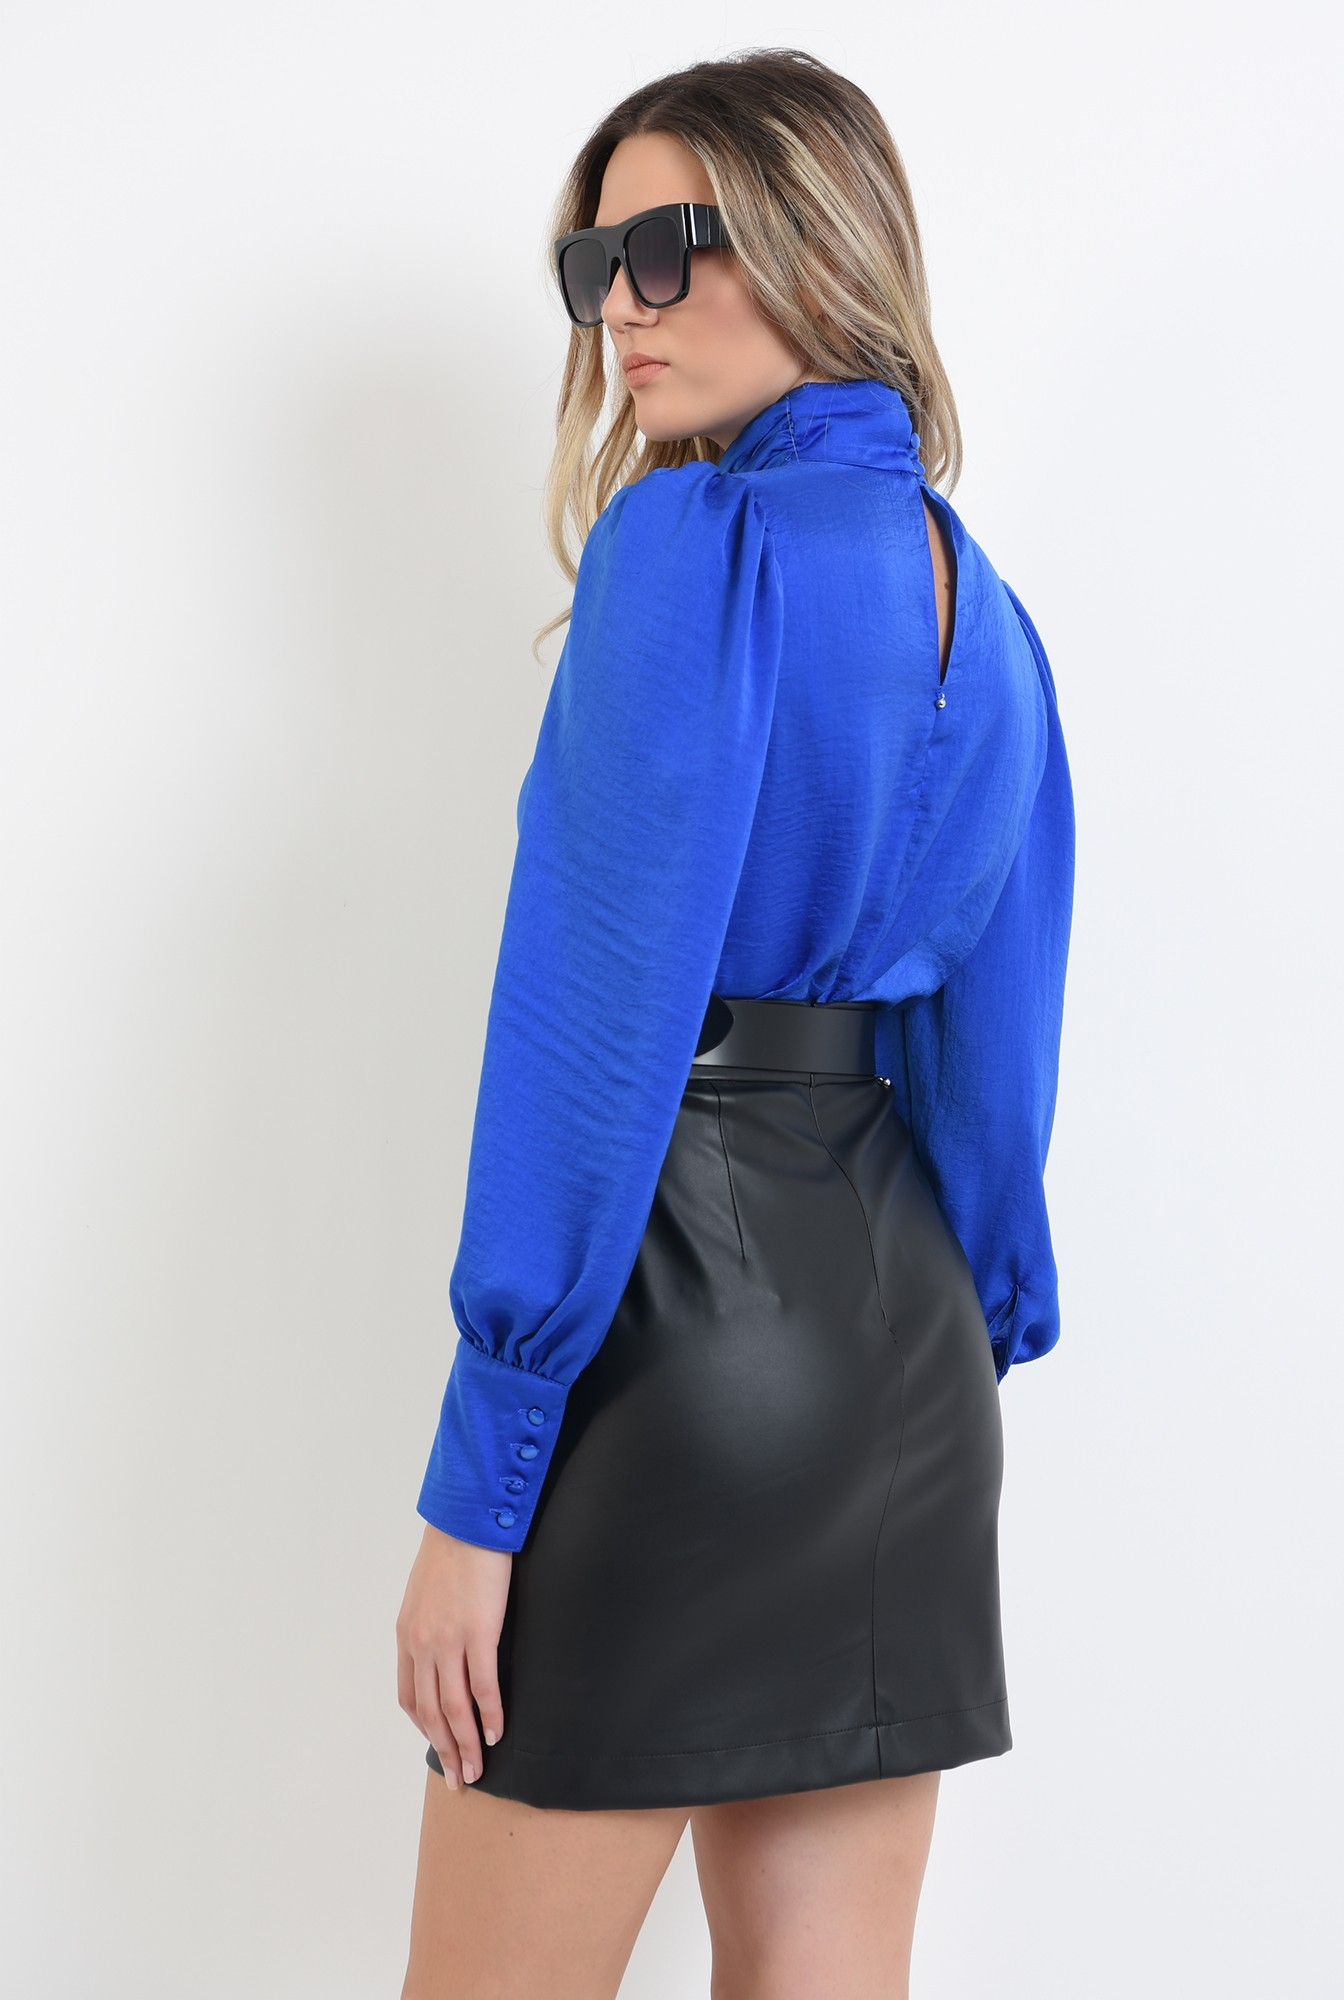 1 - 360 - bluza cu pliuri la gat, albastra, cu nasturi la manseta